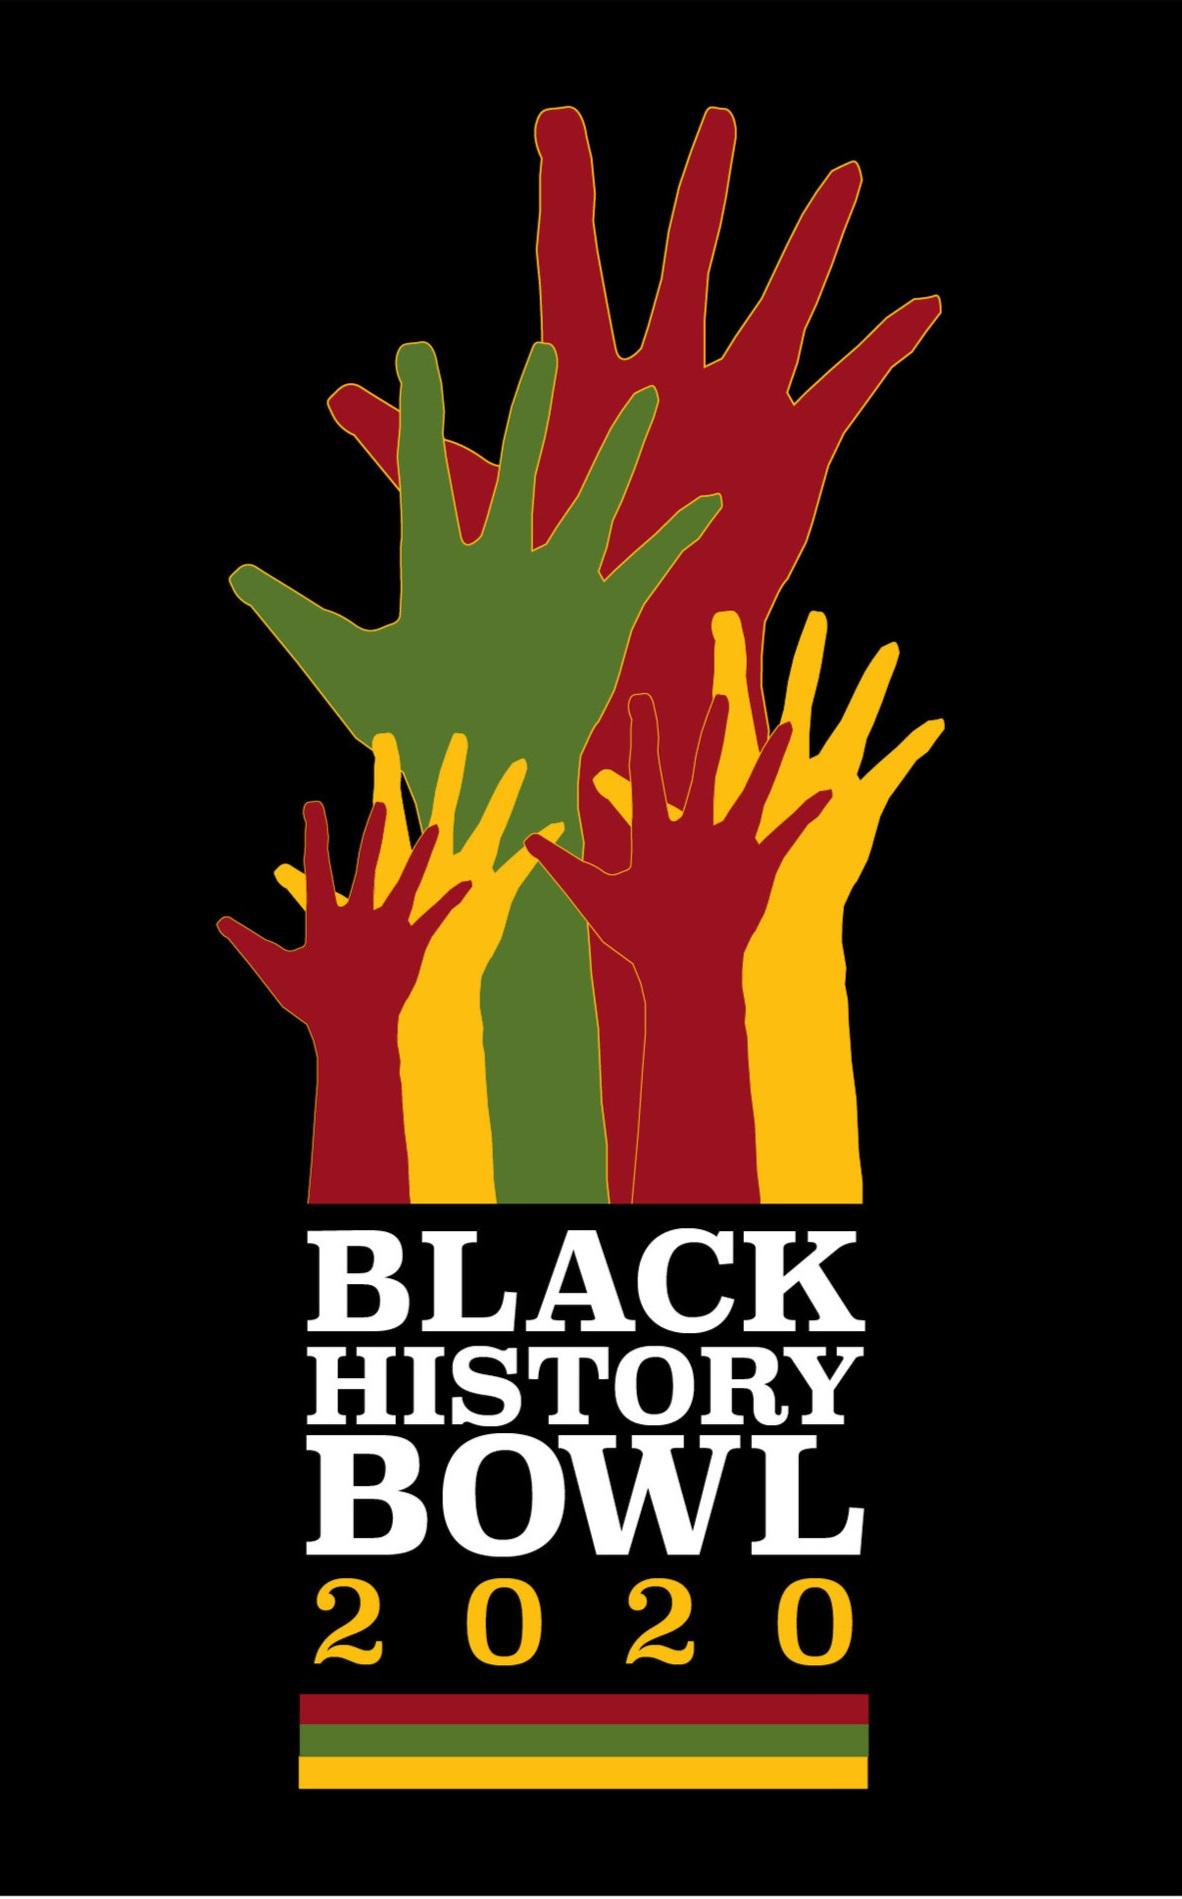 Black History Bowl.jpg